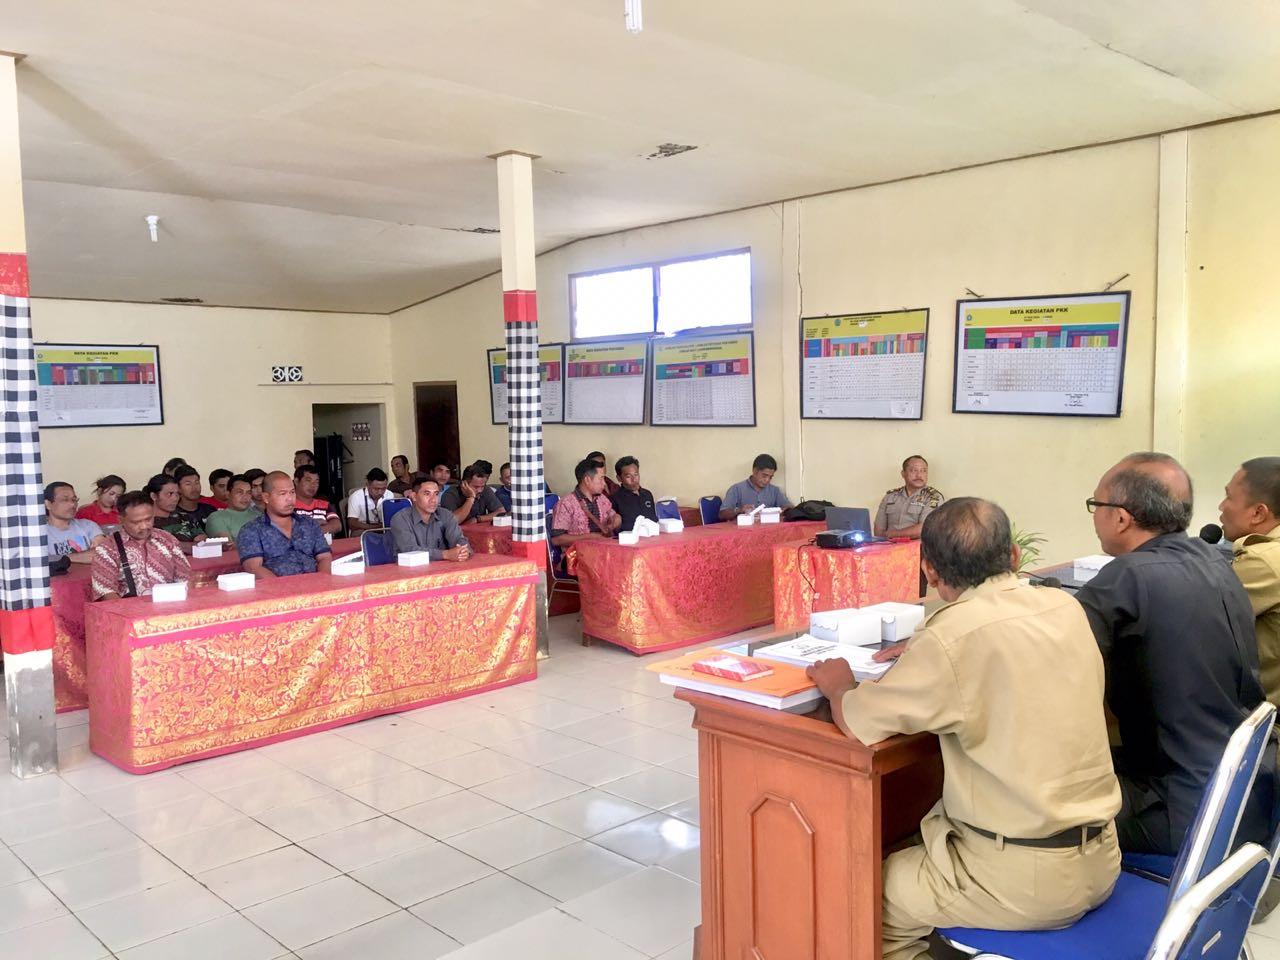 Pembinaan Keluarga Sadar Hukum Tahun 2018 di Desa Landih